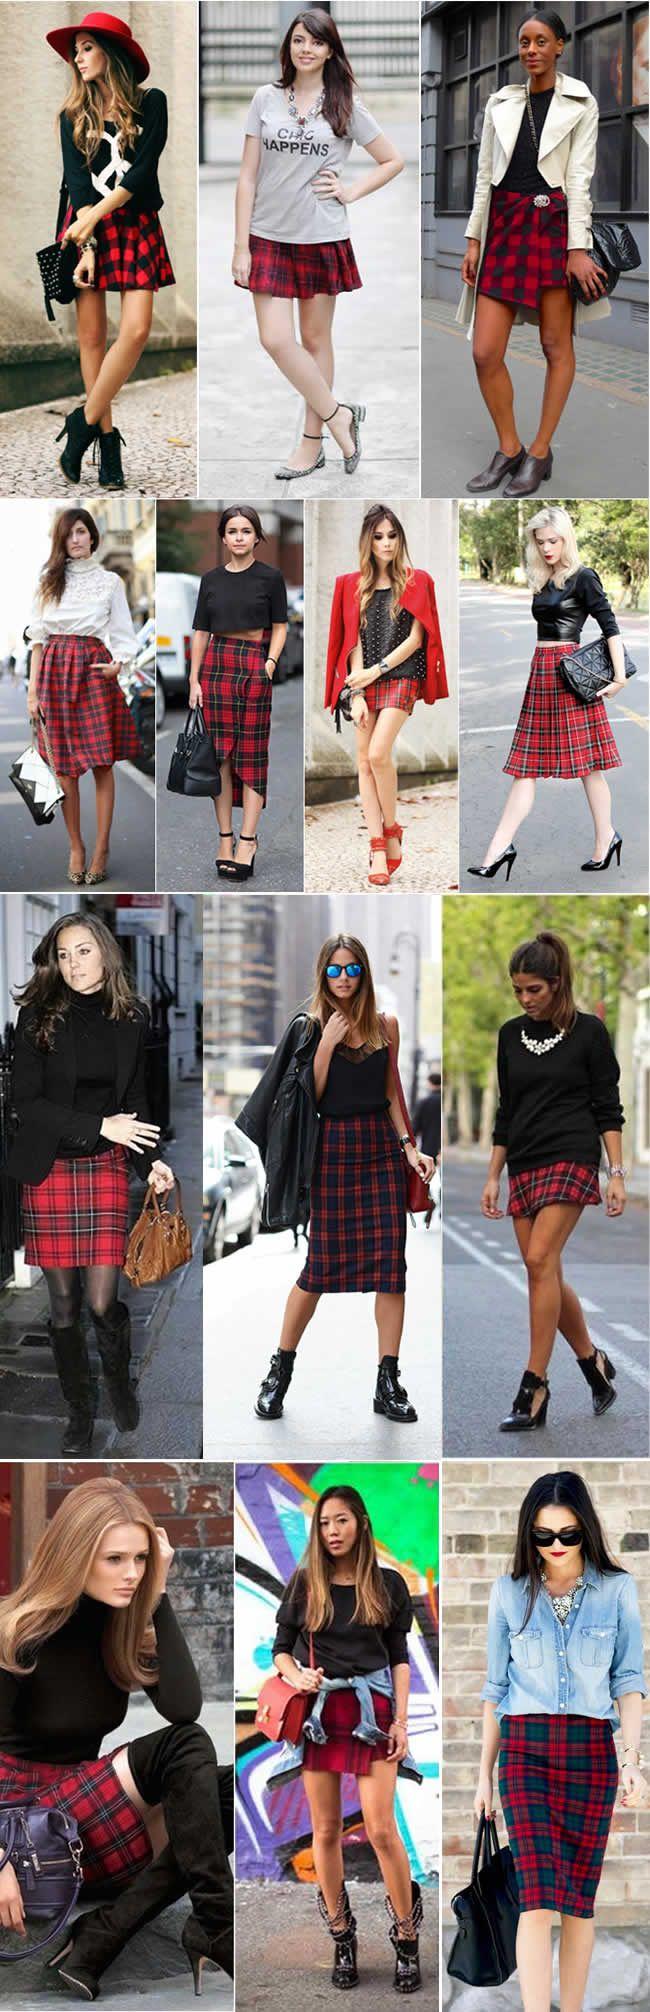 xadrez-vermelho-tartan-moda-inverno-2014-saias